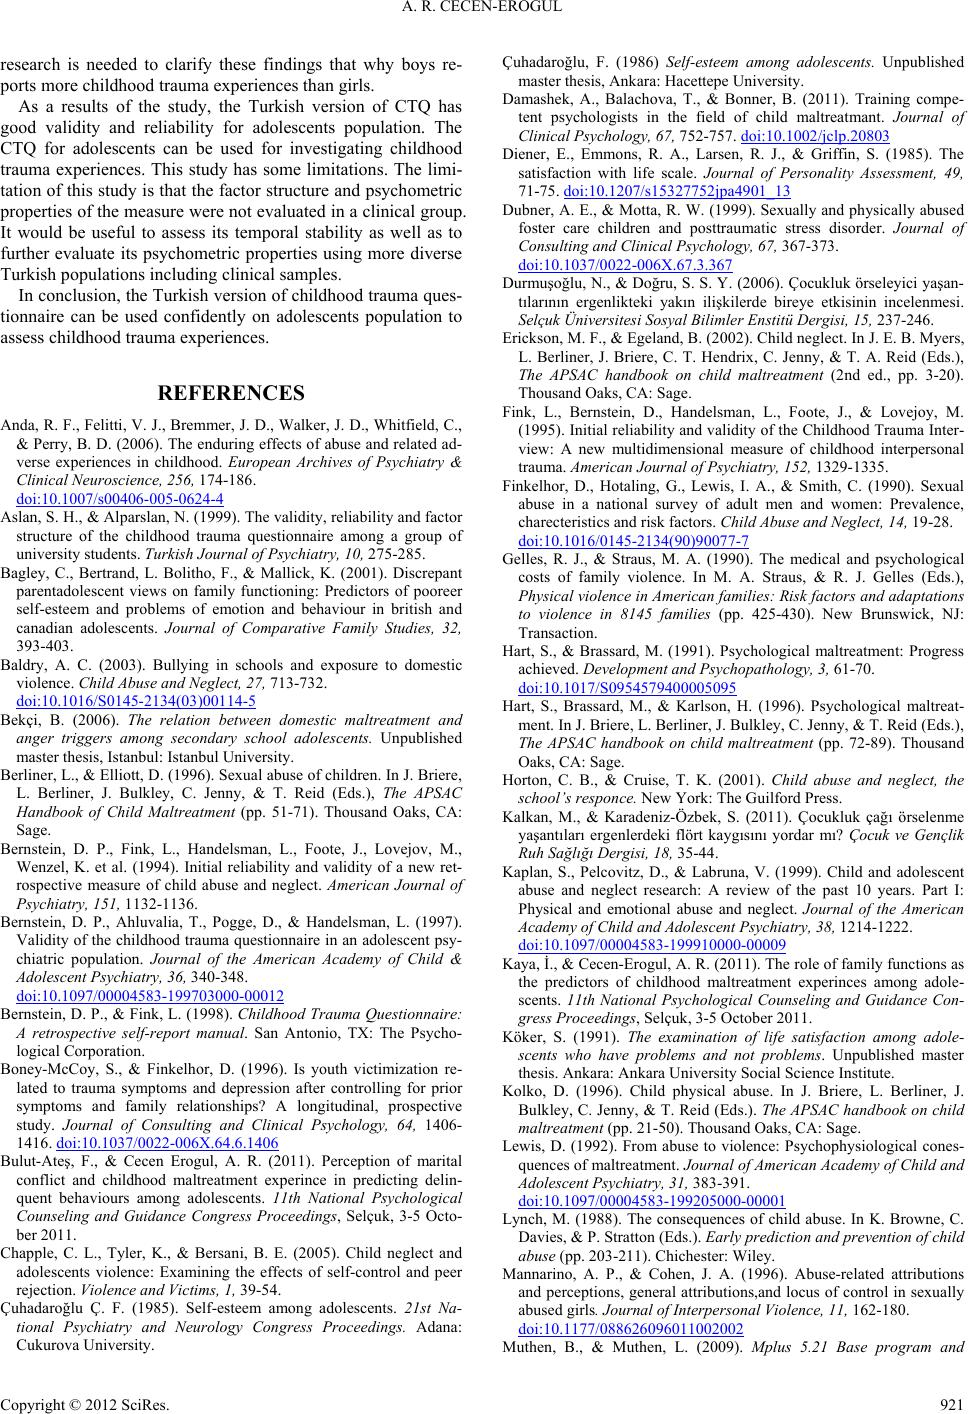 childhood trauma questionnaire bernstein pdf